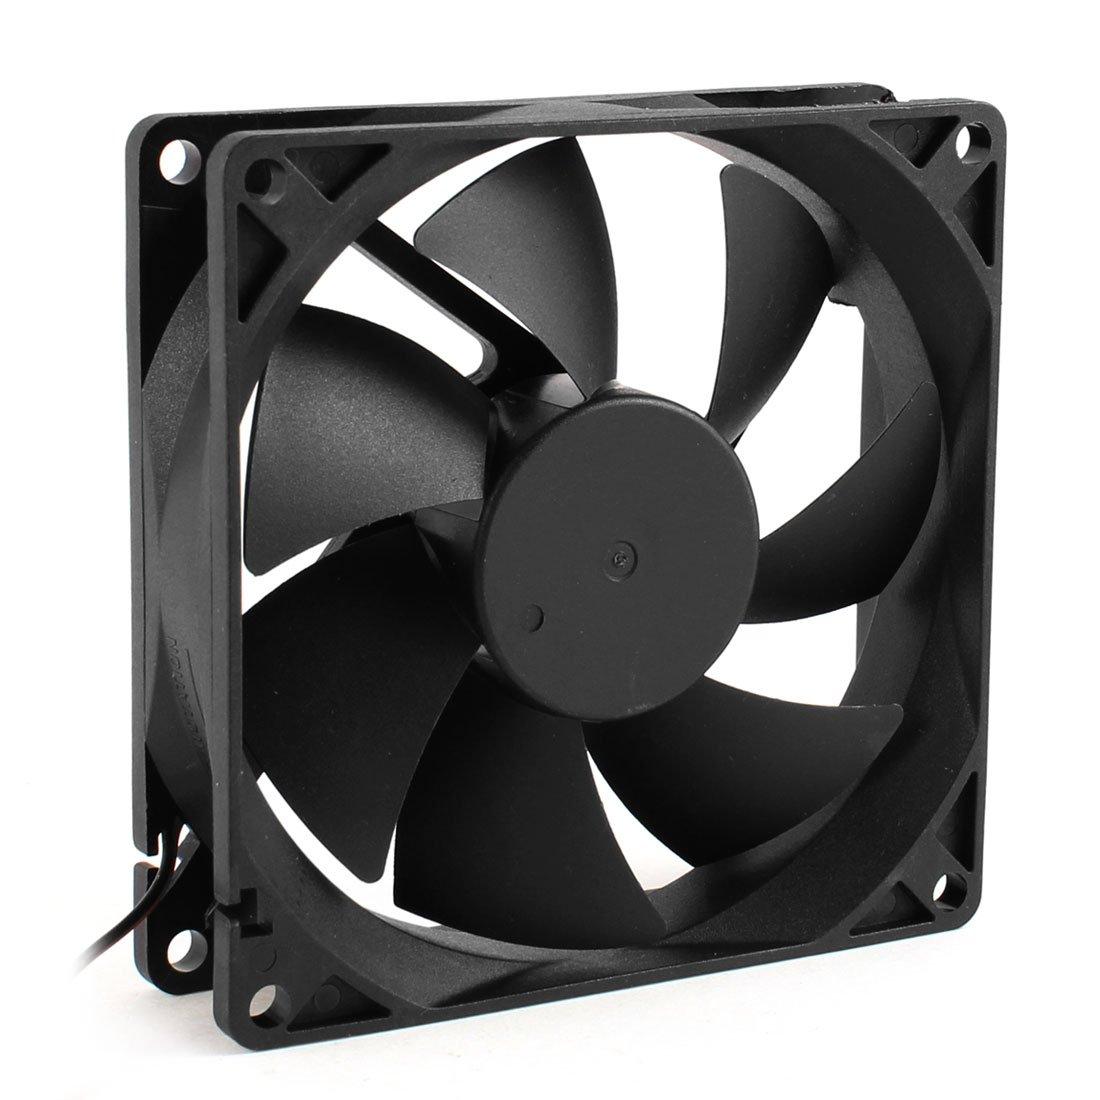 CAA Hot 92mm x 25mm 24V 2Pin Sleeve Bearing Cooling Fan for PC Case CPU Cooler gdstime 10 pcs dc 12v 14025 pc case cooling fan 140mm x 25mm 14cm 2 wire 2pin connector computer 140x140x25mm